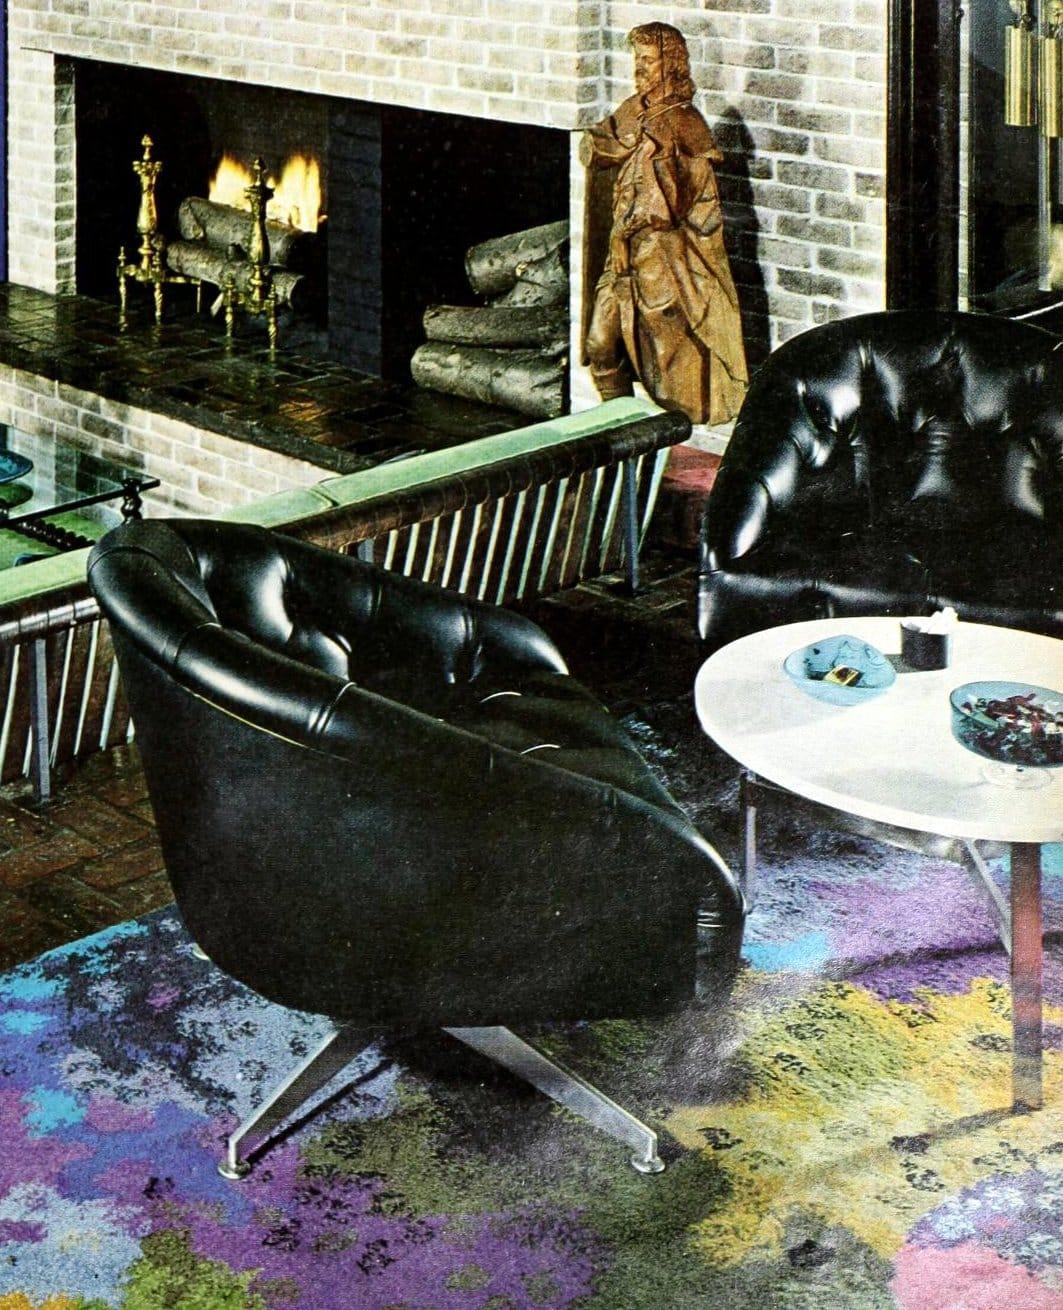 Vintage black vinyl deep-buttoned upholstered living room swivel chairs (1965)